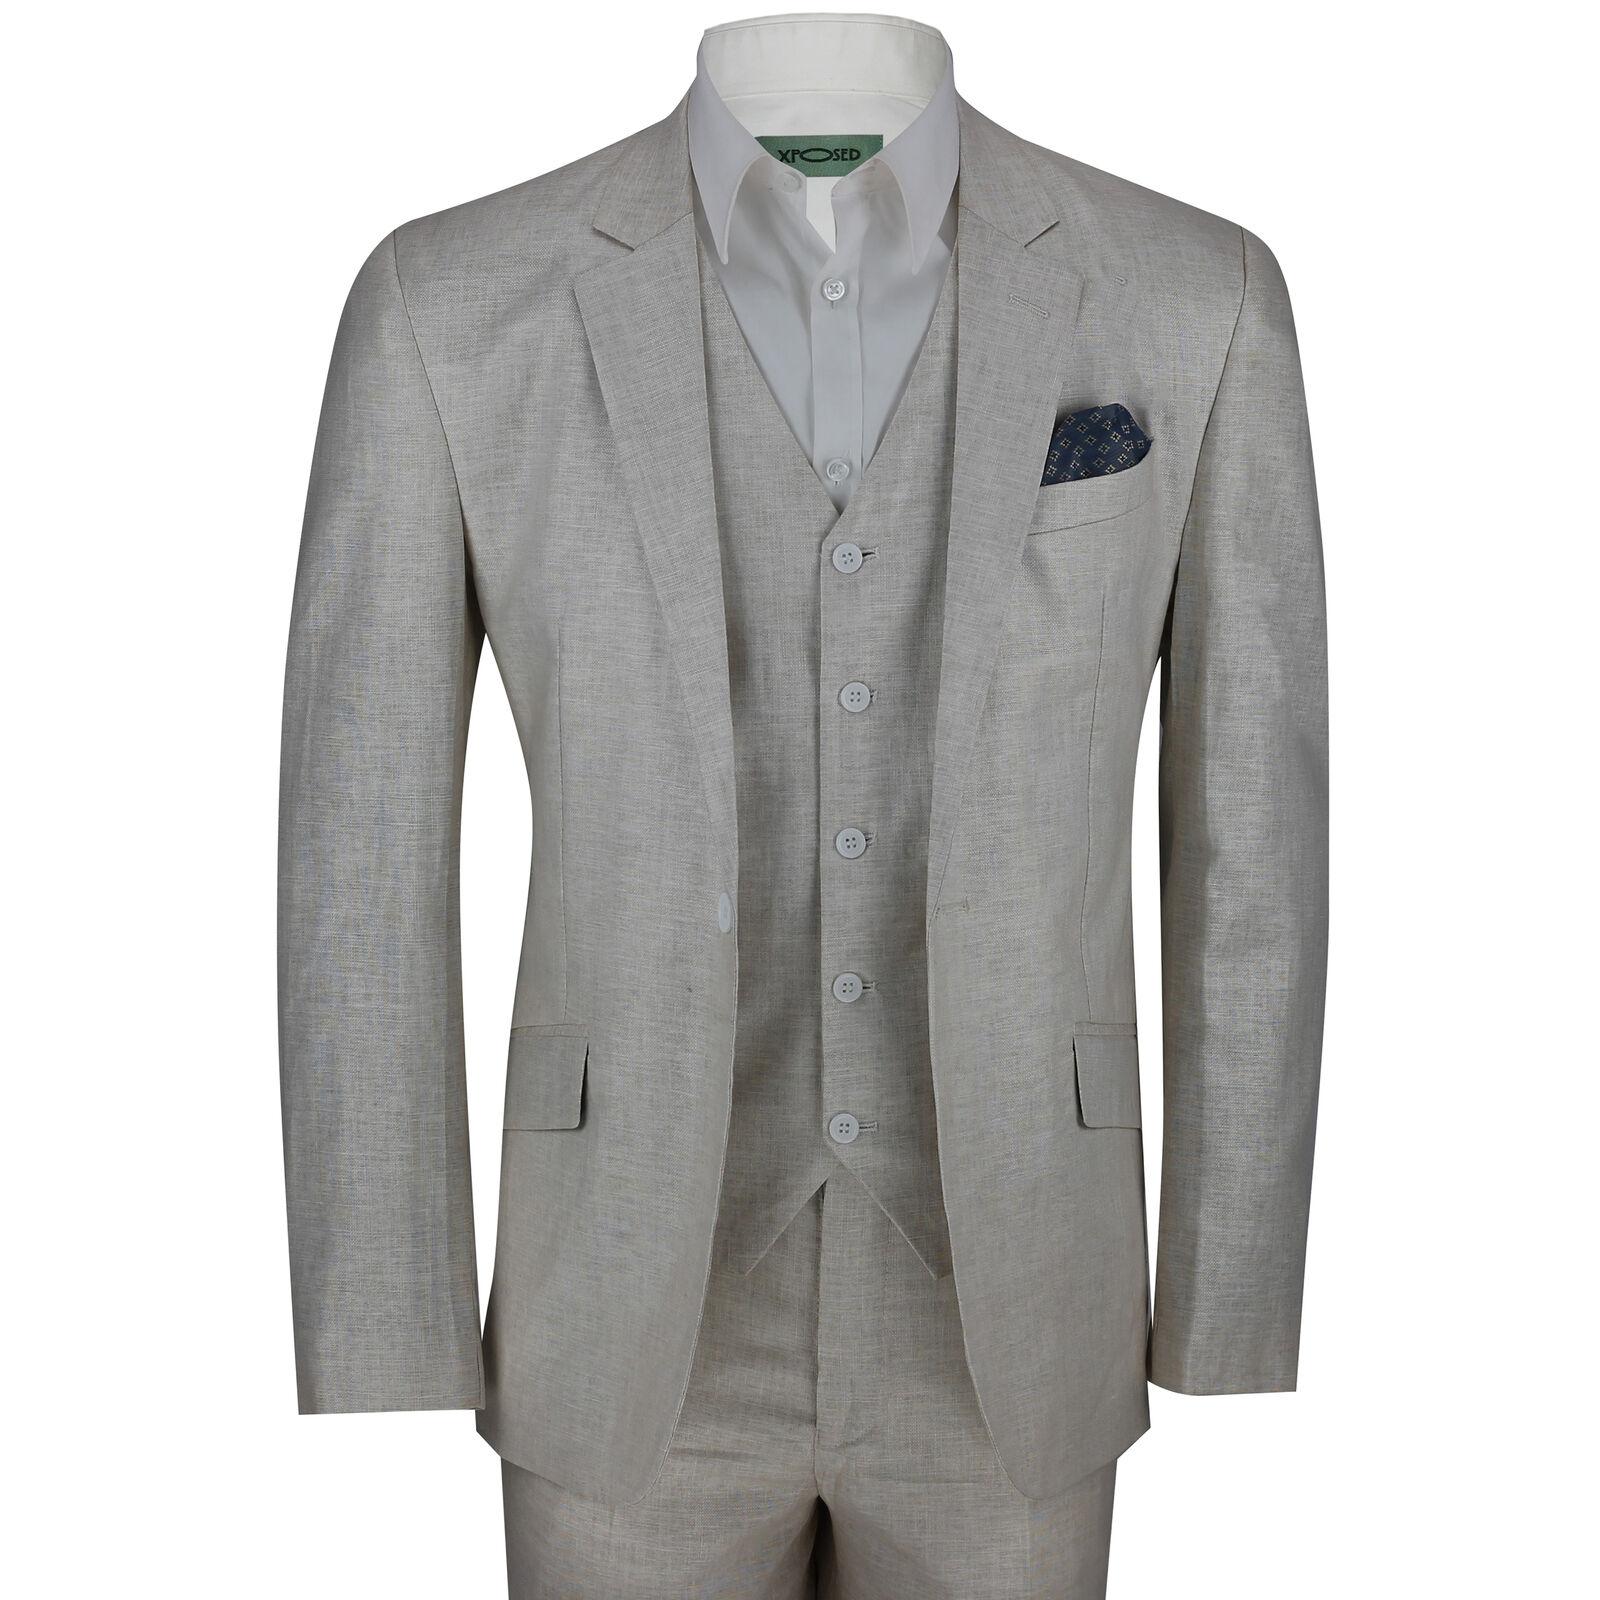 New  Herren Cream 3 Piece Cotton Linen Blend TailoROT Fit Vintage Suit Smart Casual